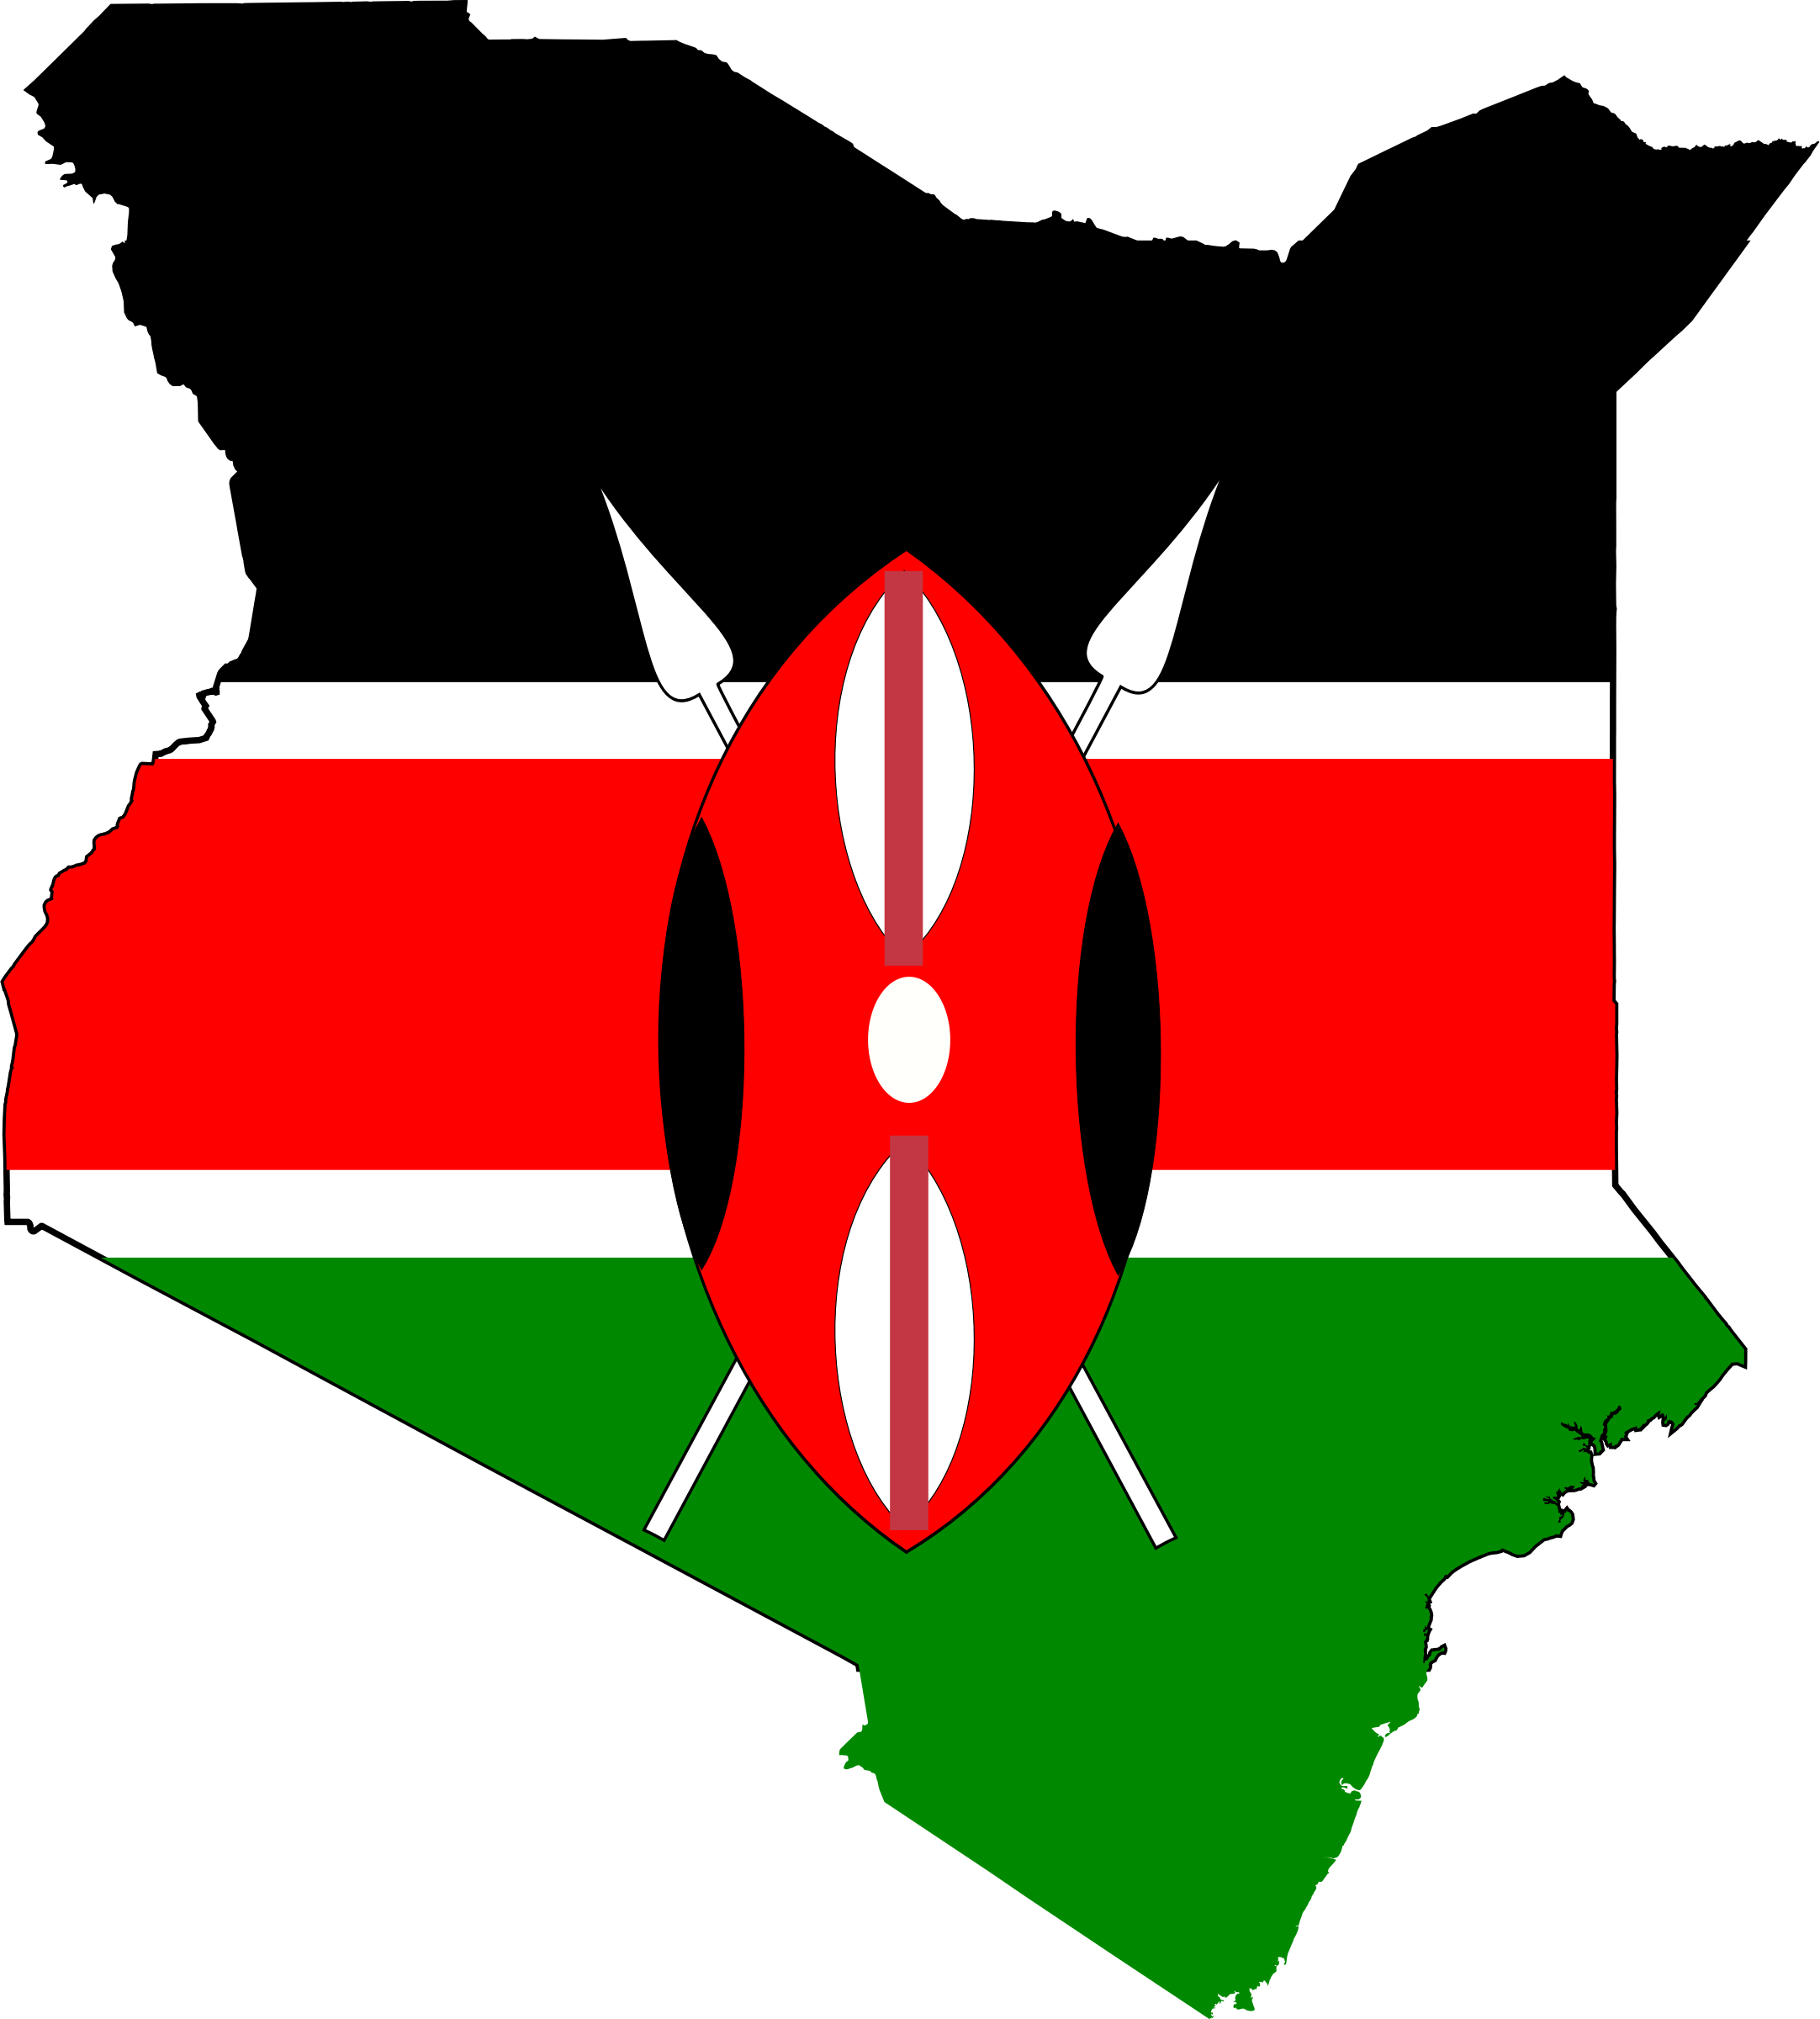 Clipart Kenya Map Flag - Kenya map